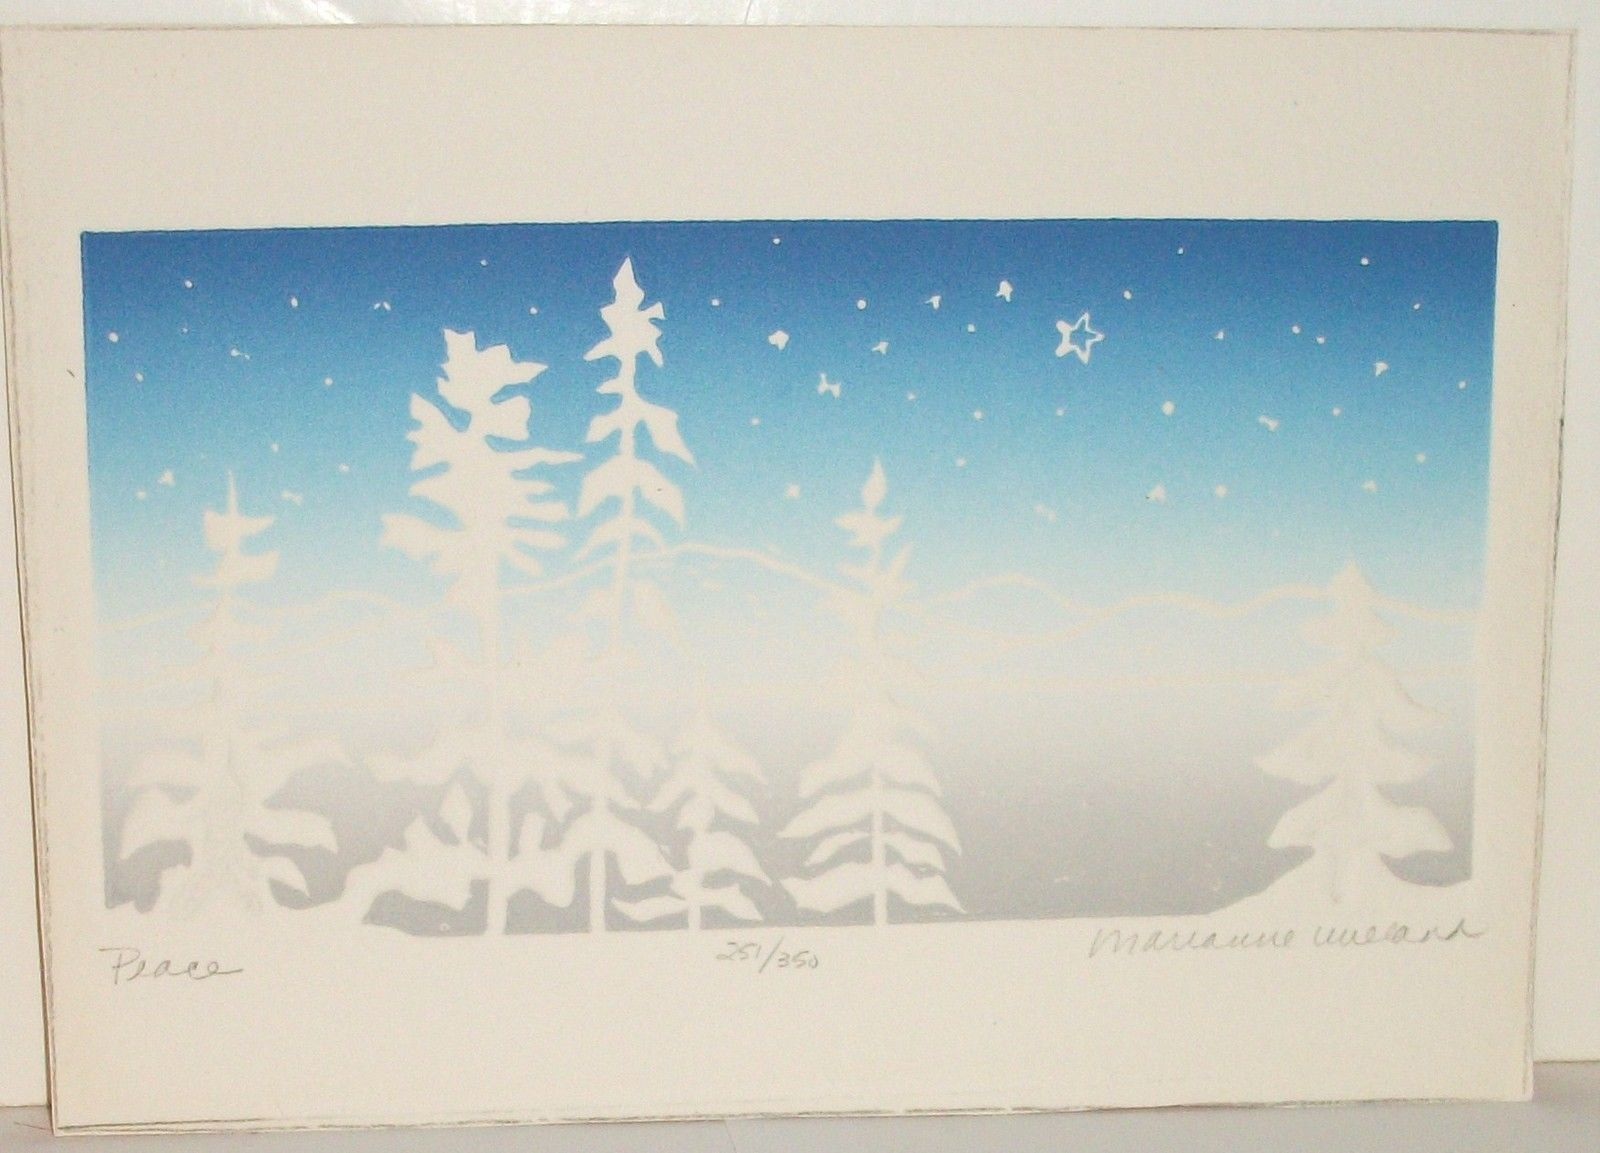 Pin by sue monsen on marianne wieland prints prints art